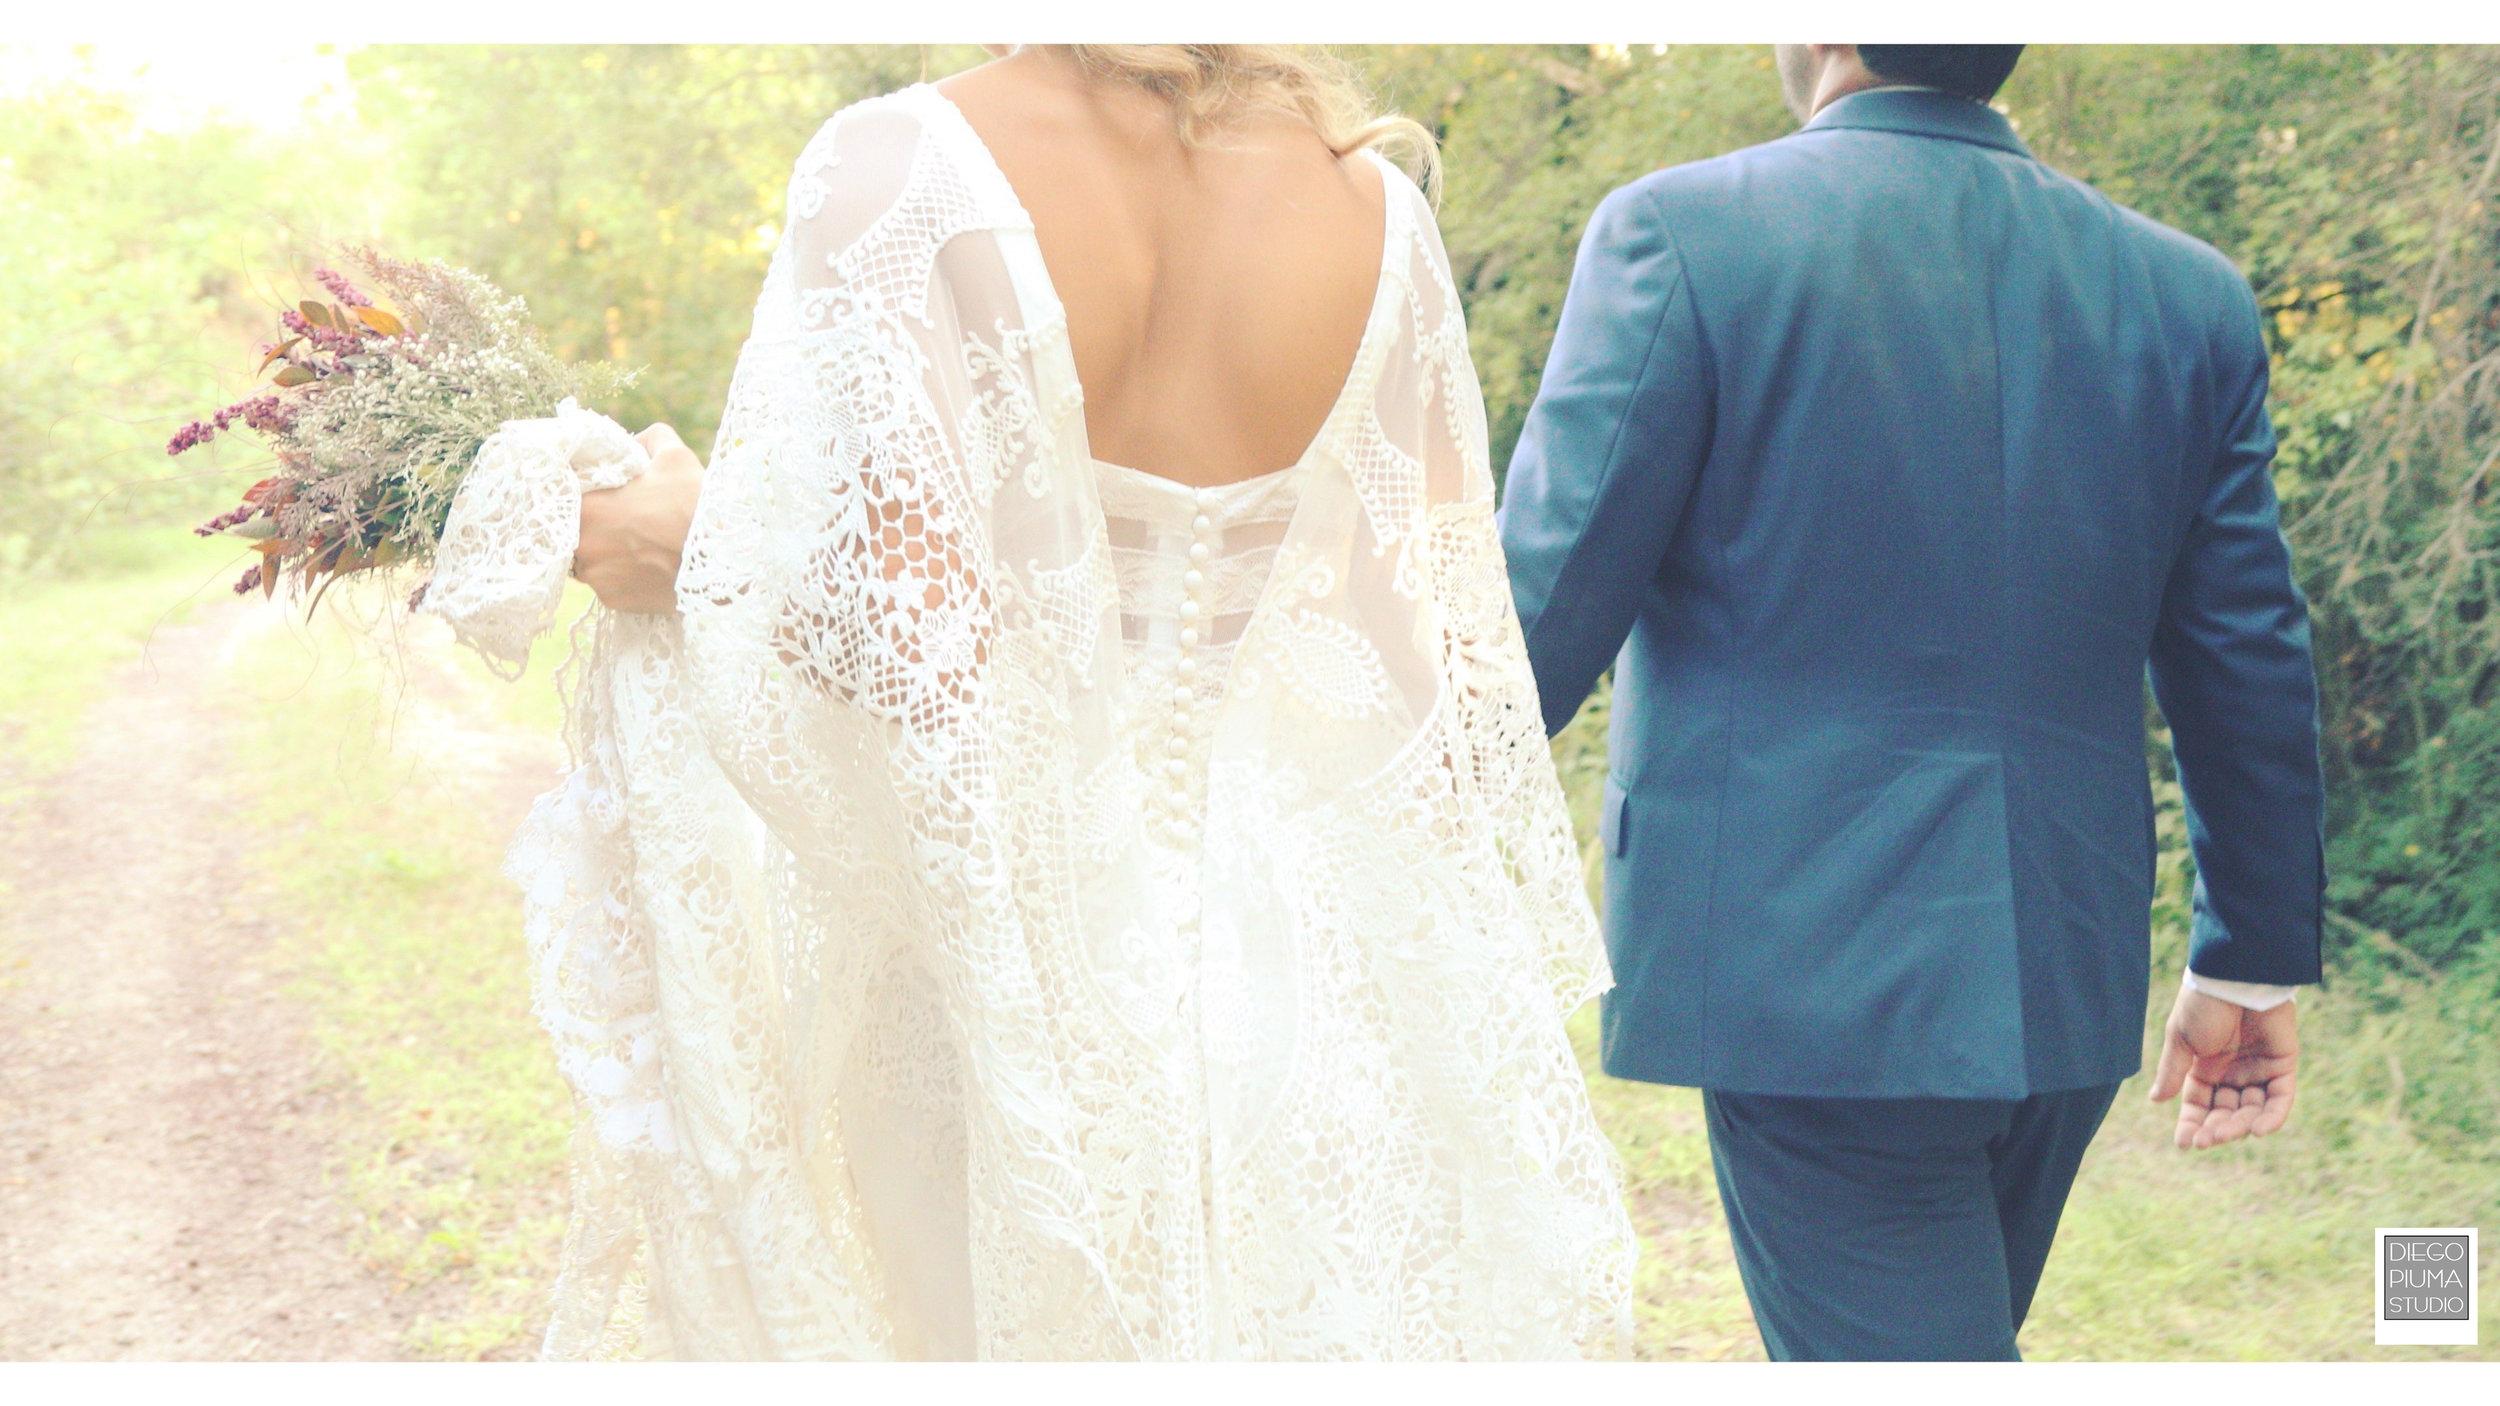 05-Fotografía-Bodas-Casamiento-Eventos-Fiesta-Diego-Piuma.jpg